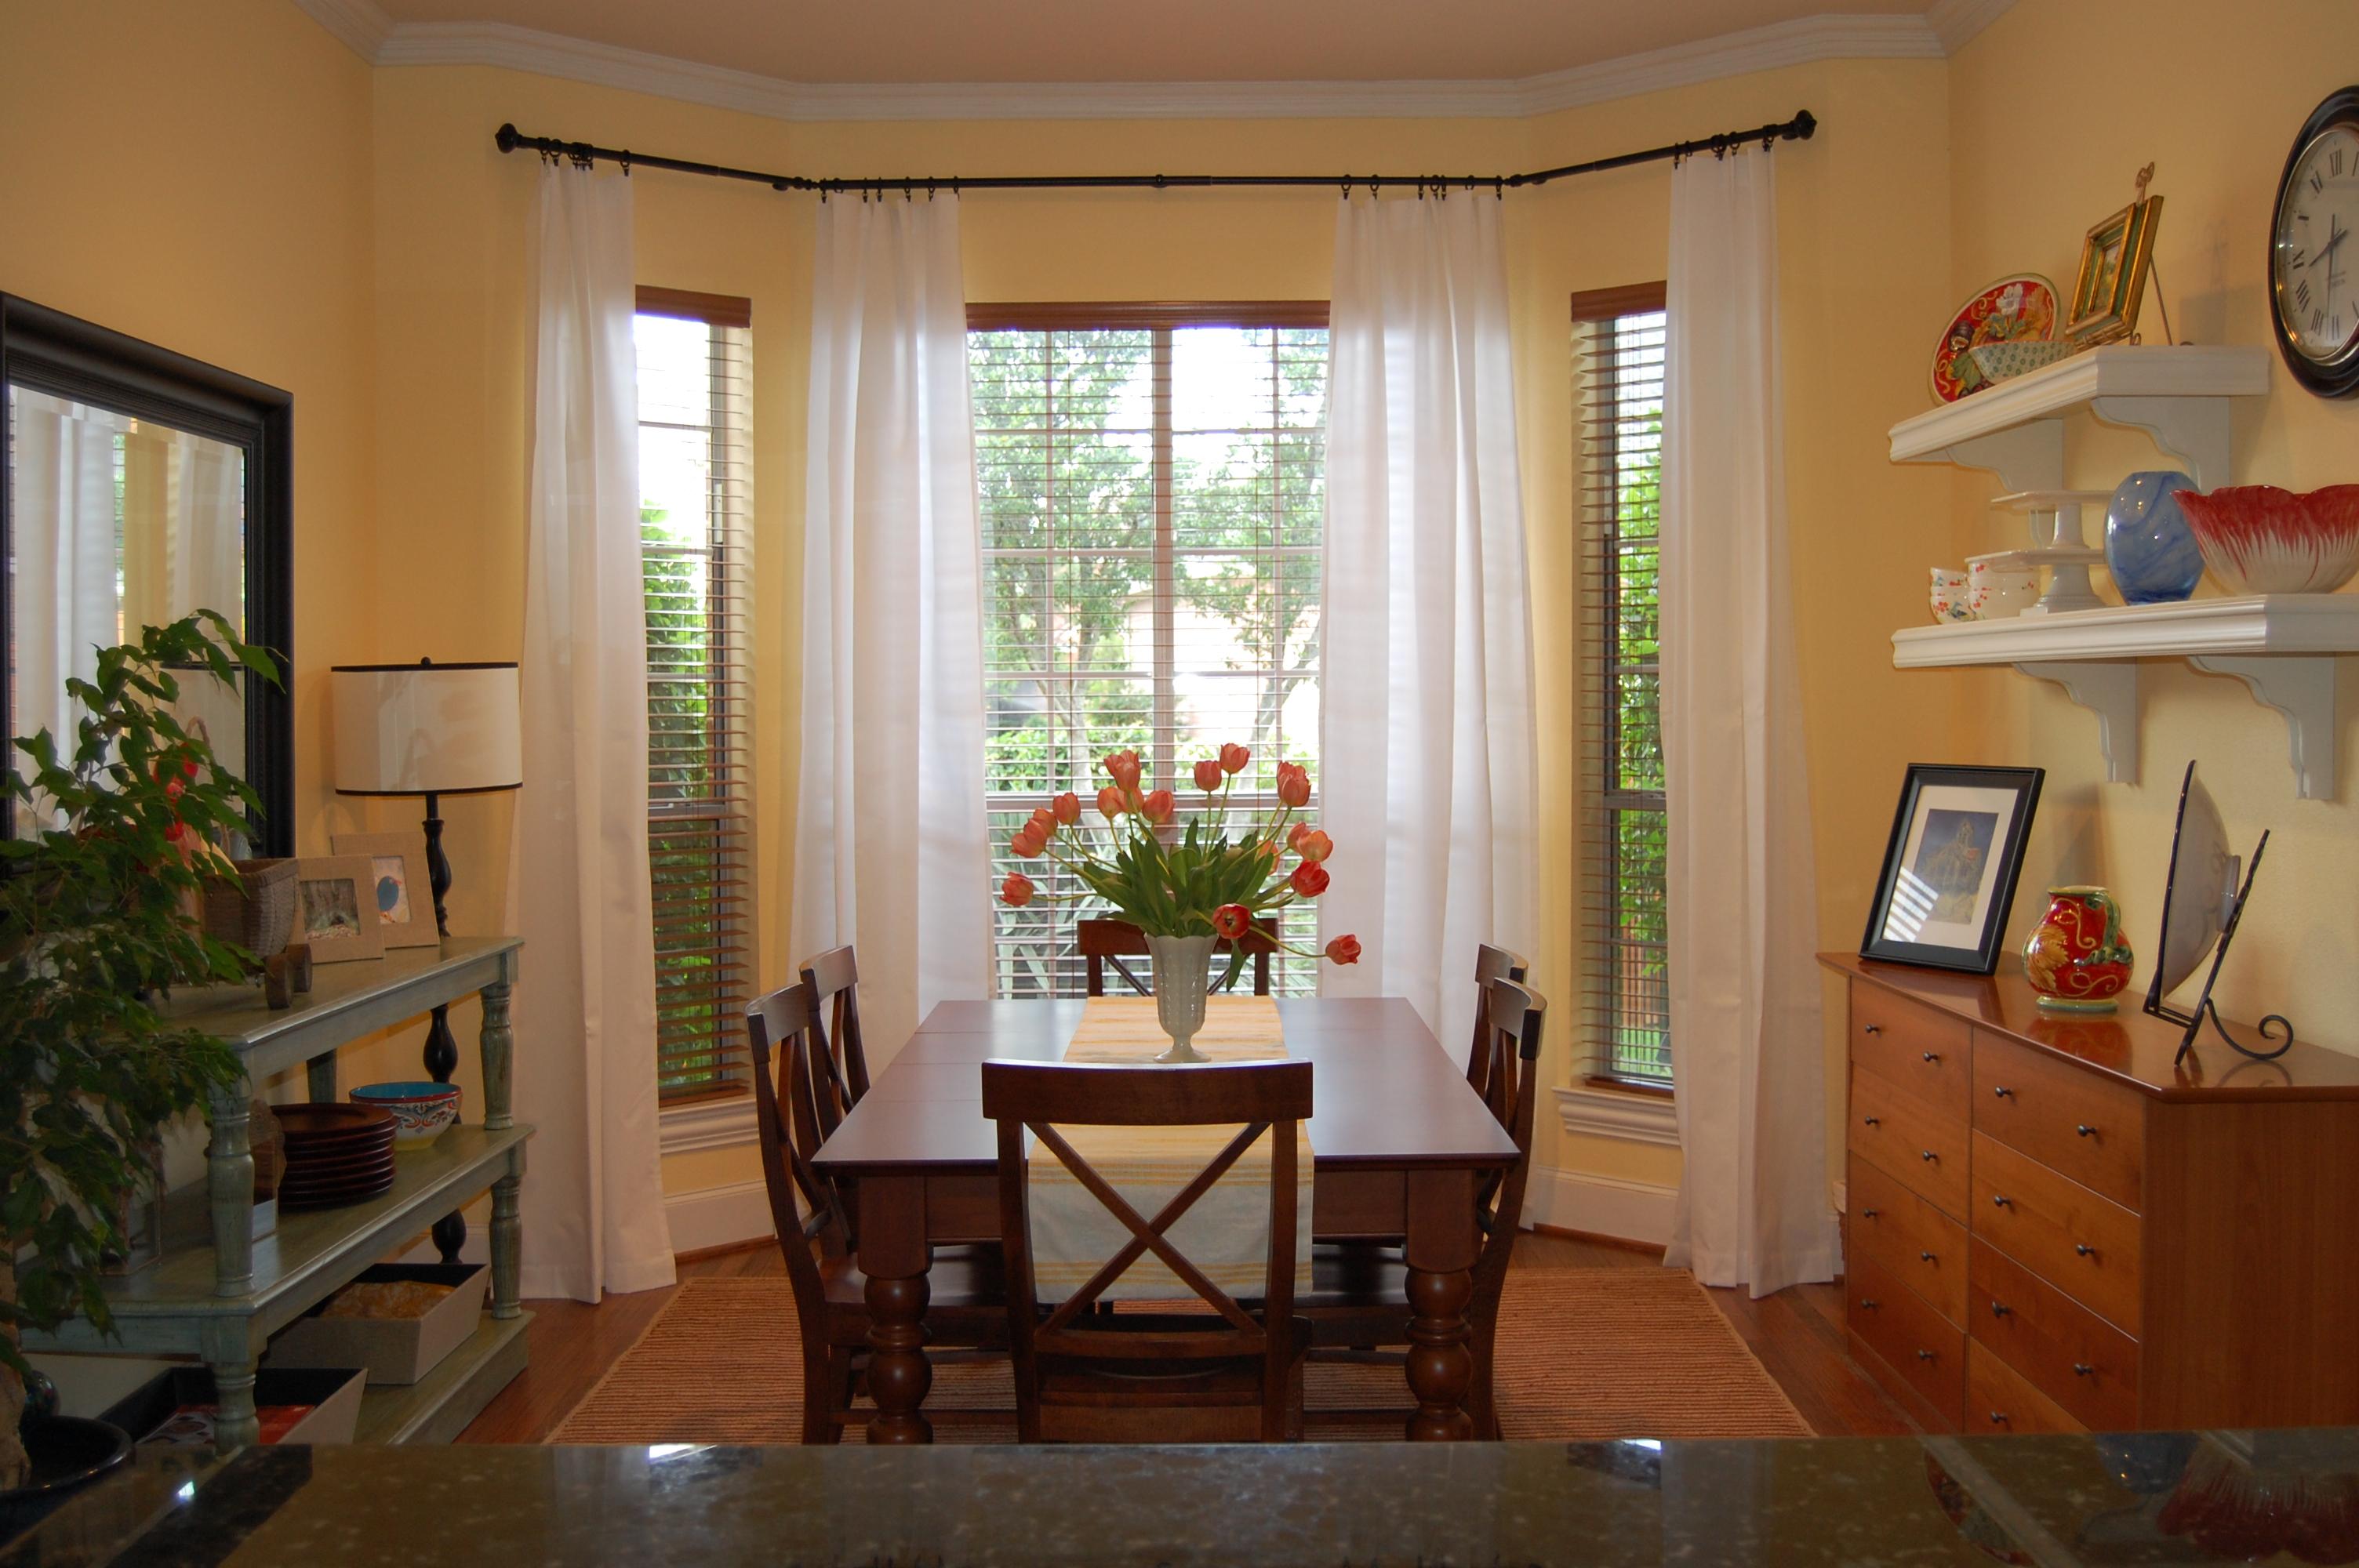 Window Treatments for Dining Room Ideas - HomesFeed on Dining Room Curtain Ideas  id=97746